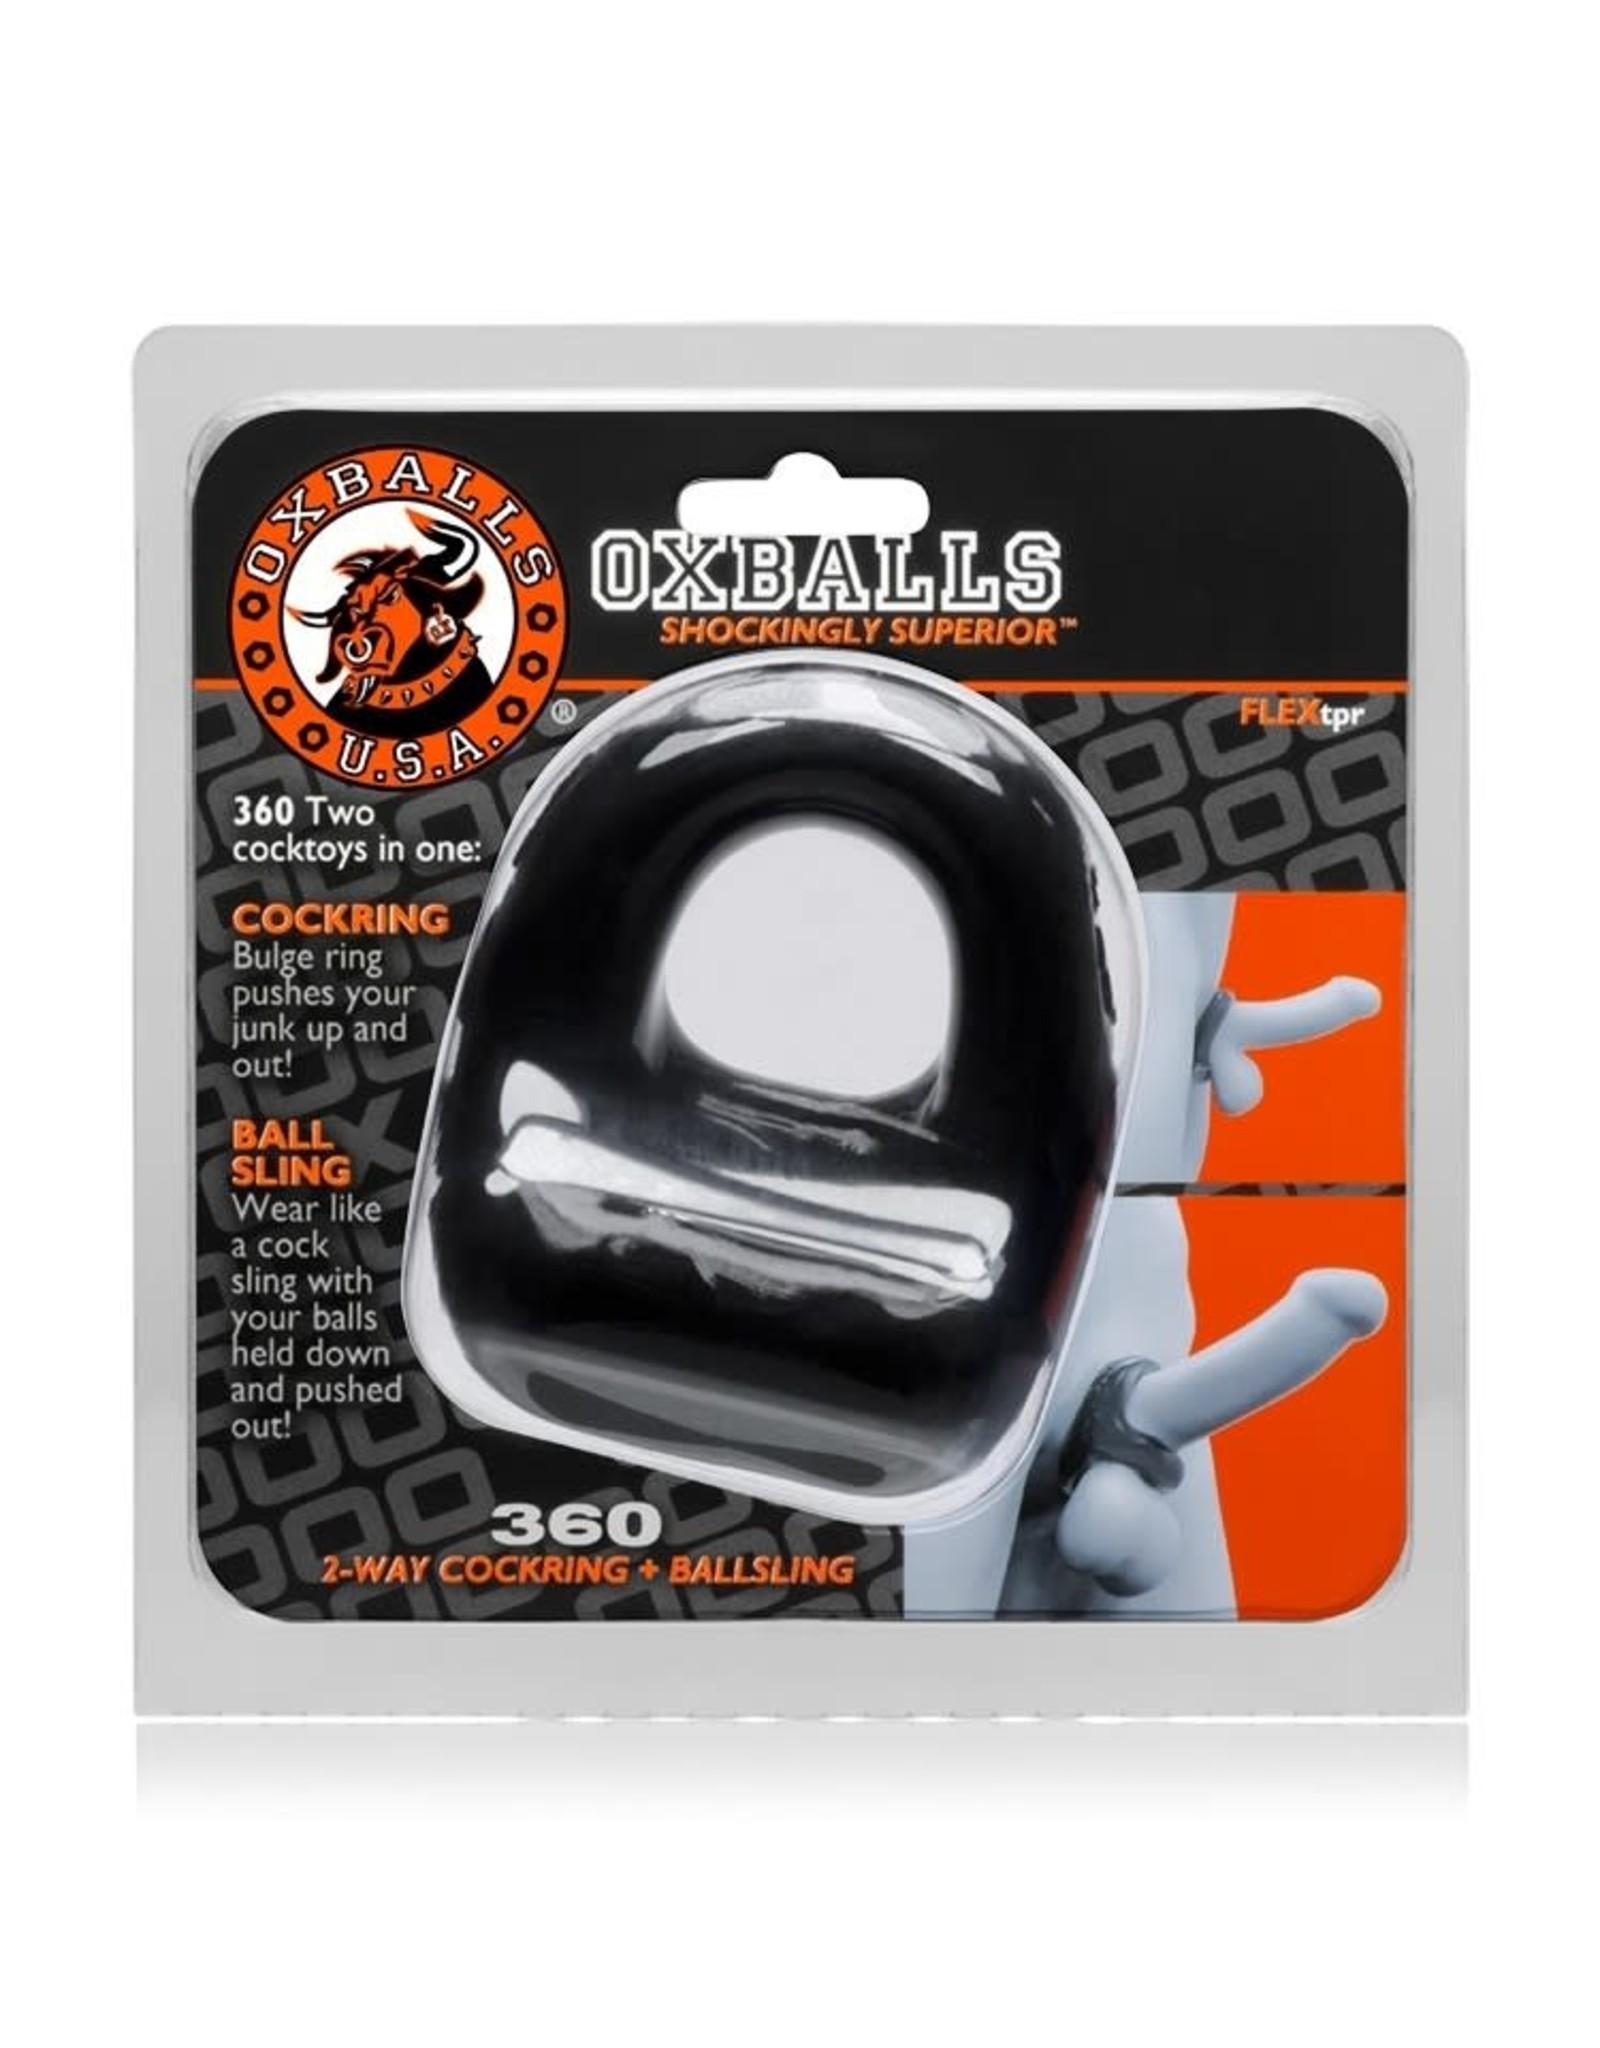 Oxballs OxBalls 360 Dual Cockring